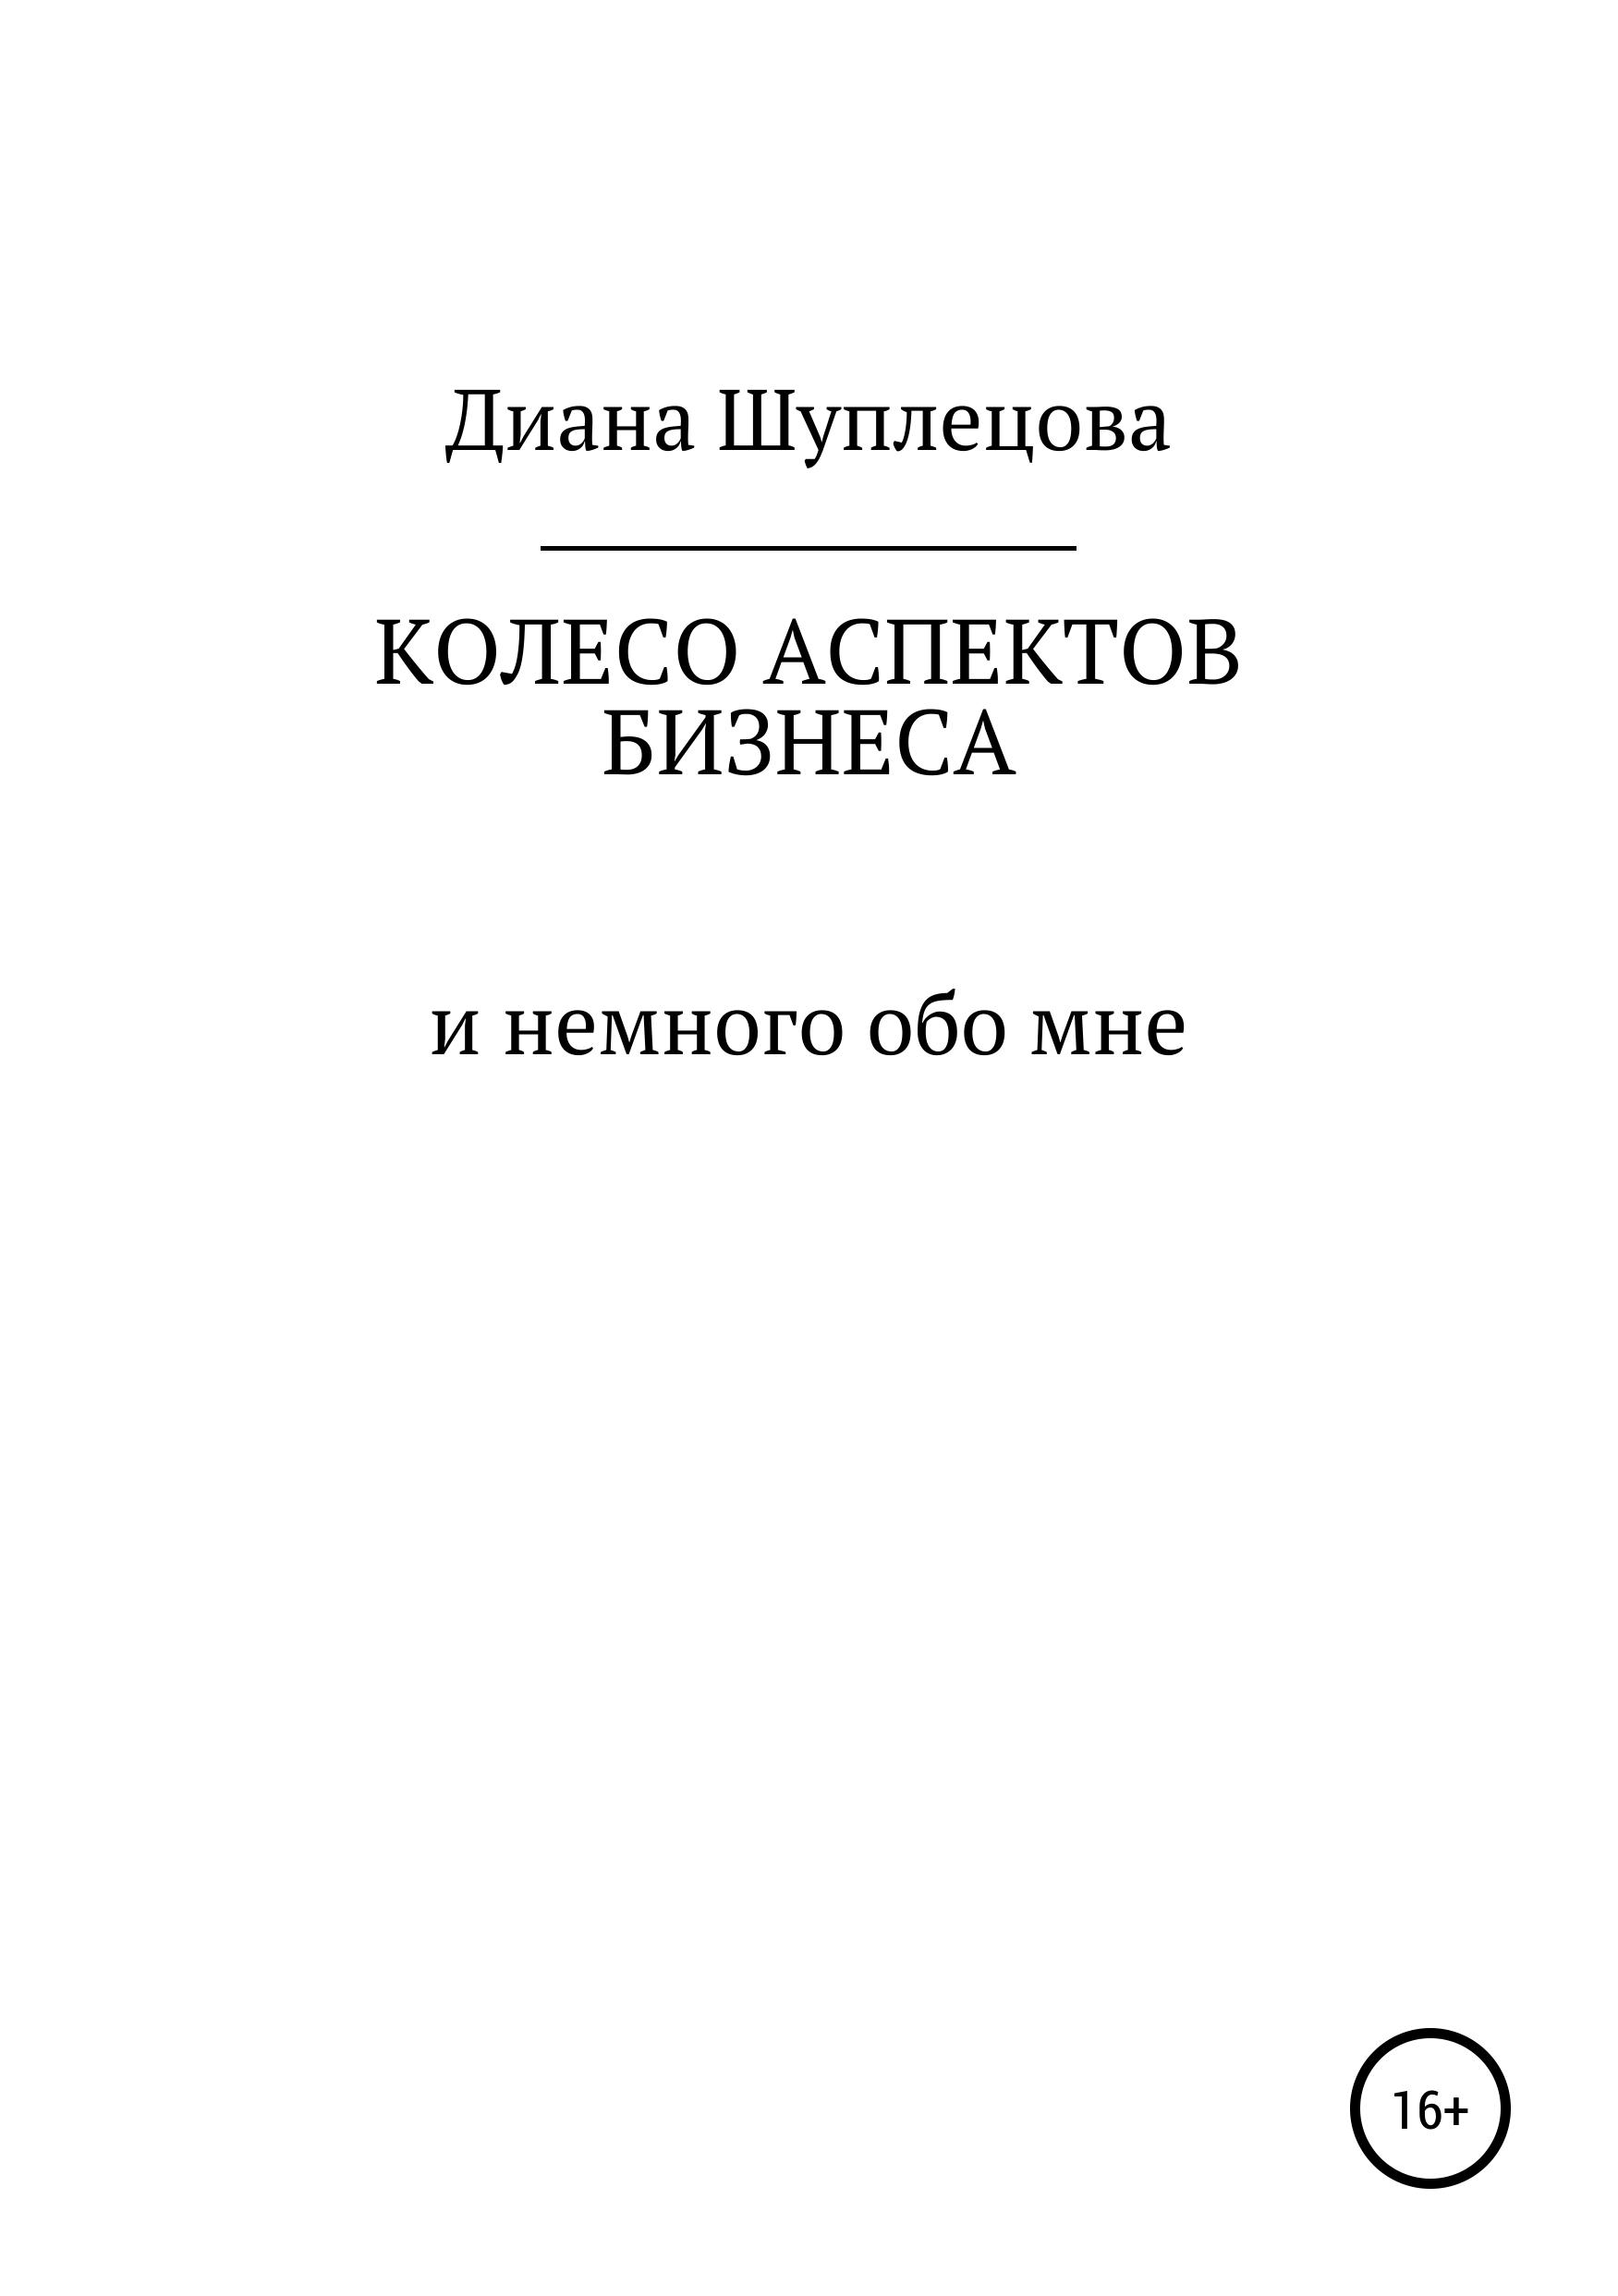 Обложка книги. Автор - Диана Шуплецова